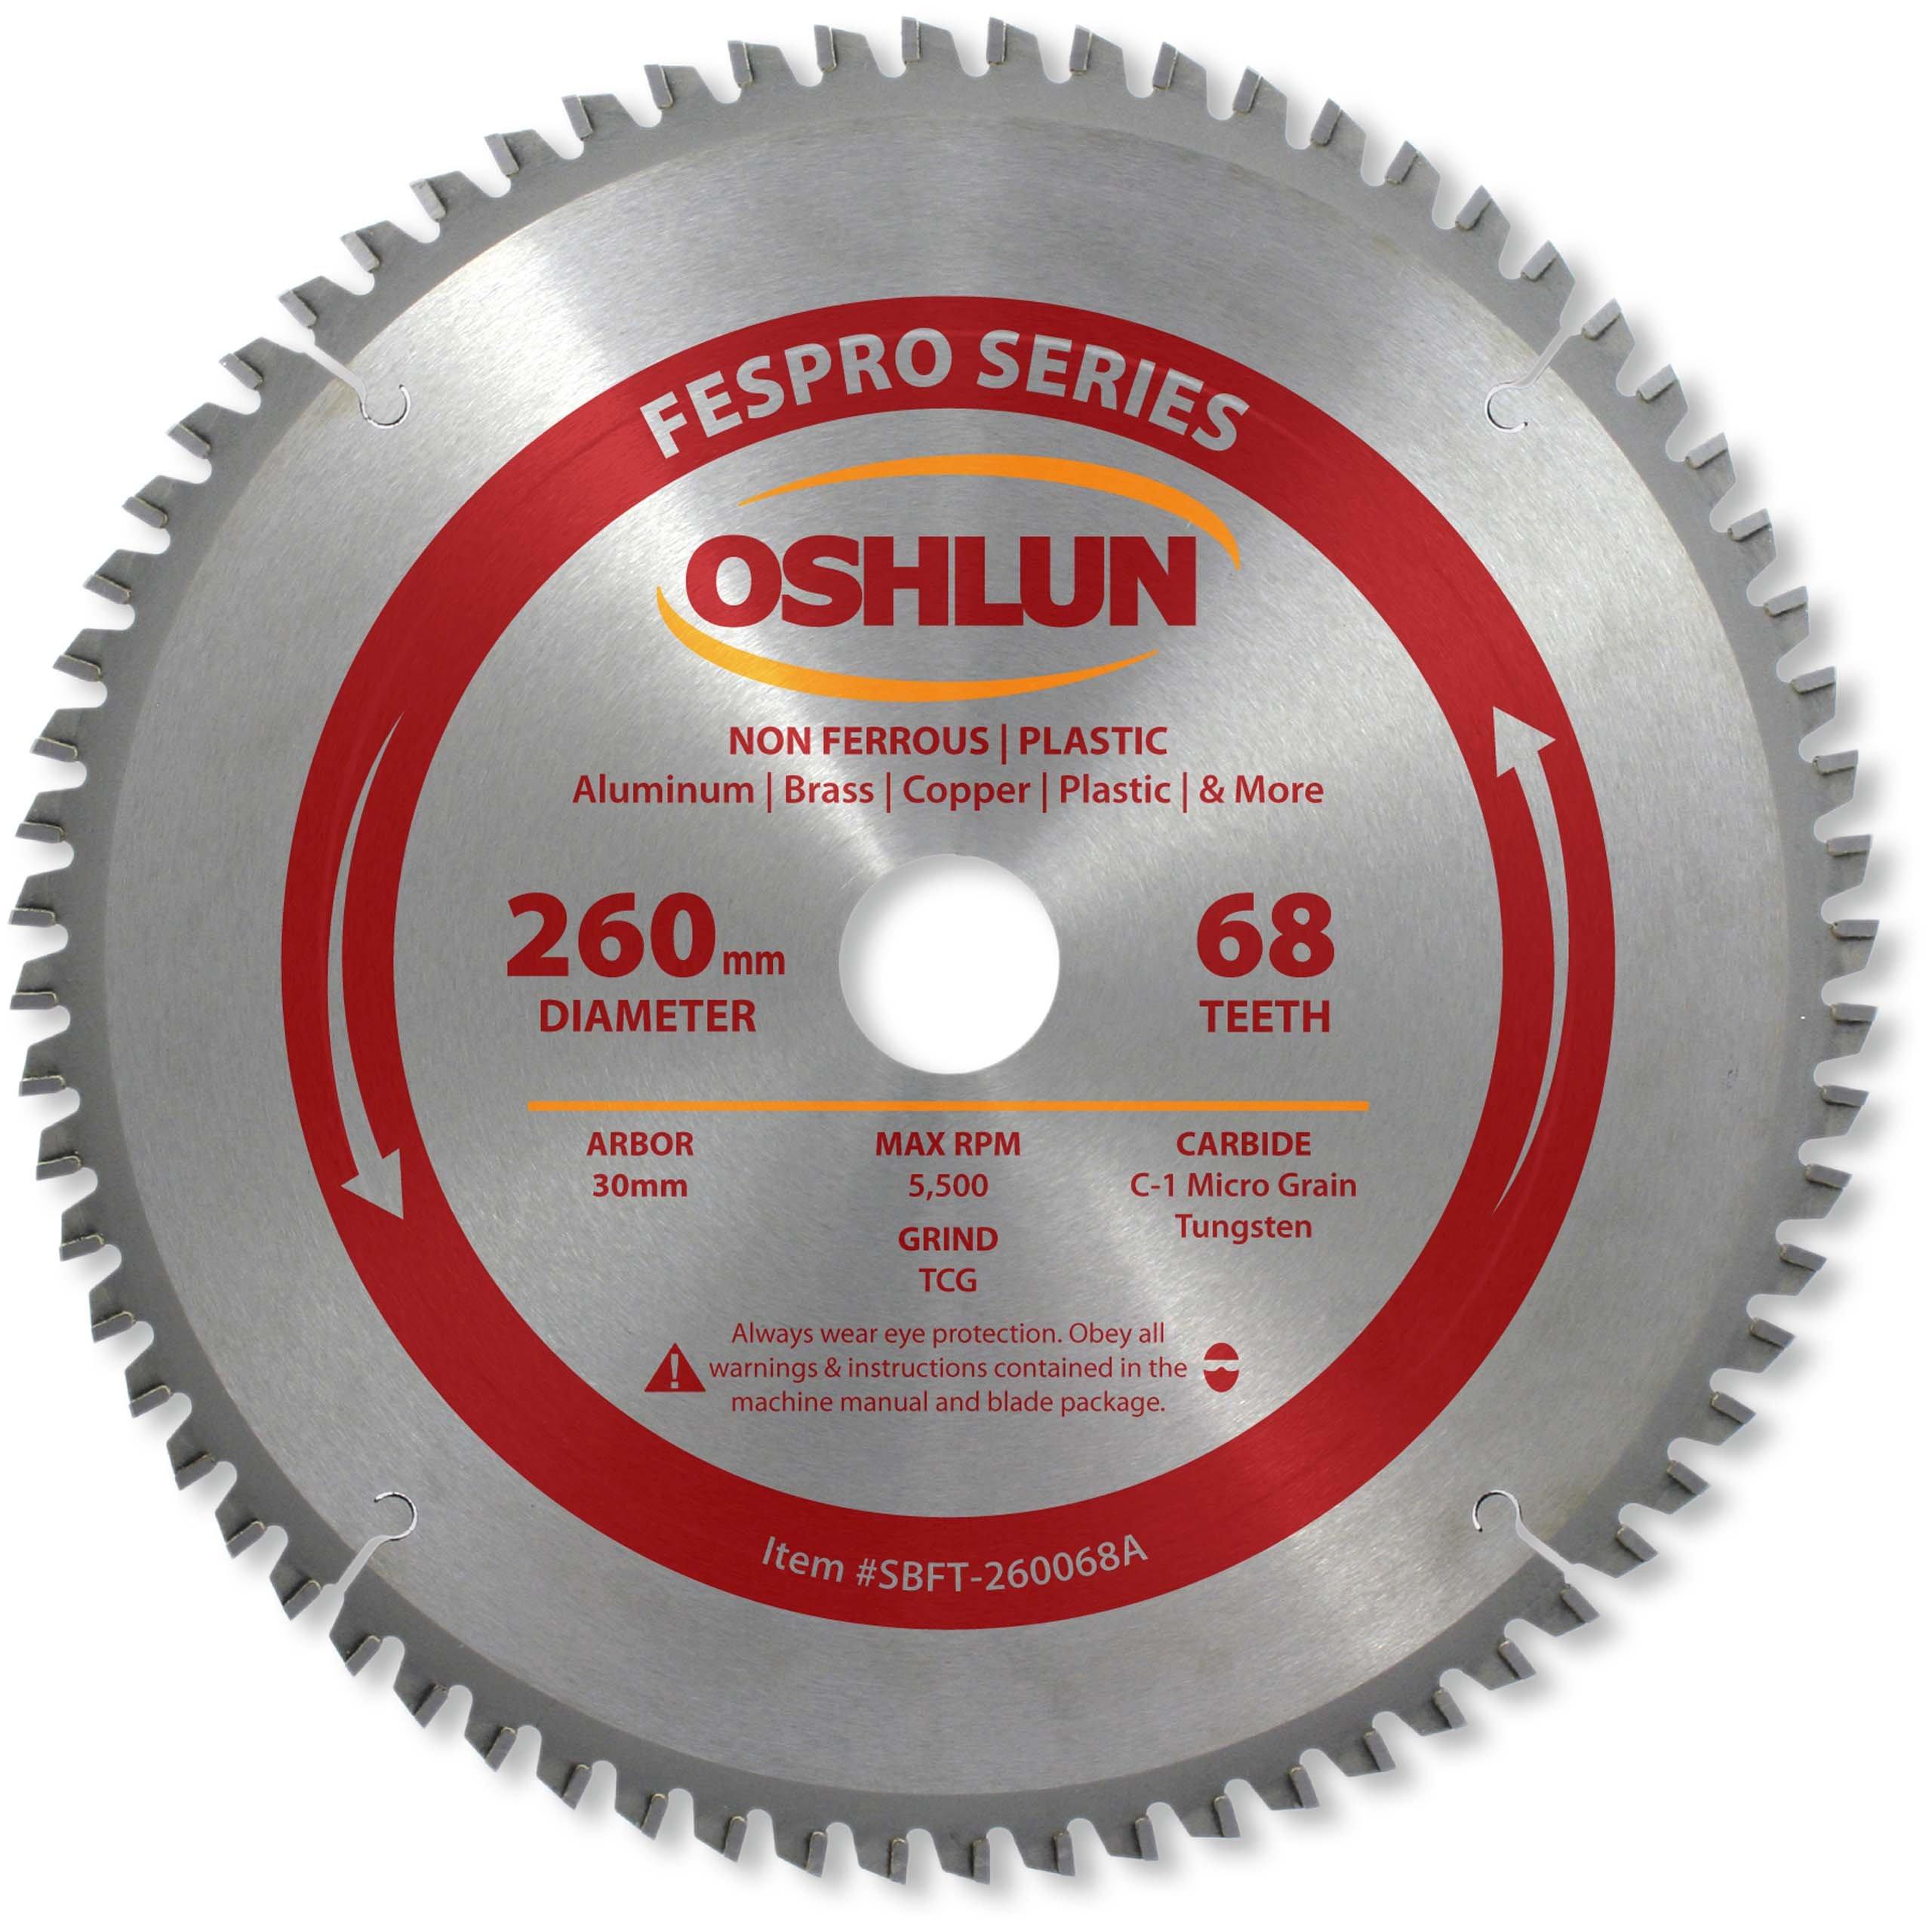 Disco Sierra OSHLUN SBFT 260068A 260mm 68T FesPro TCG no f